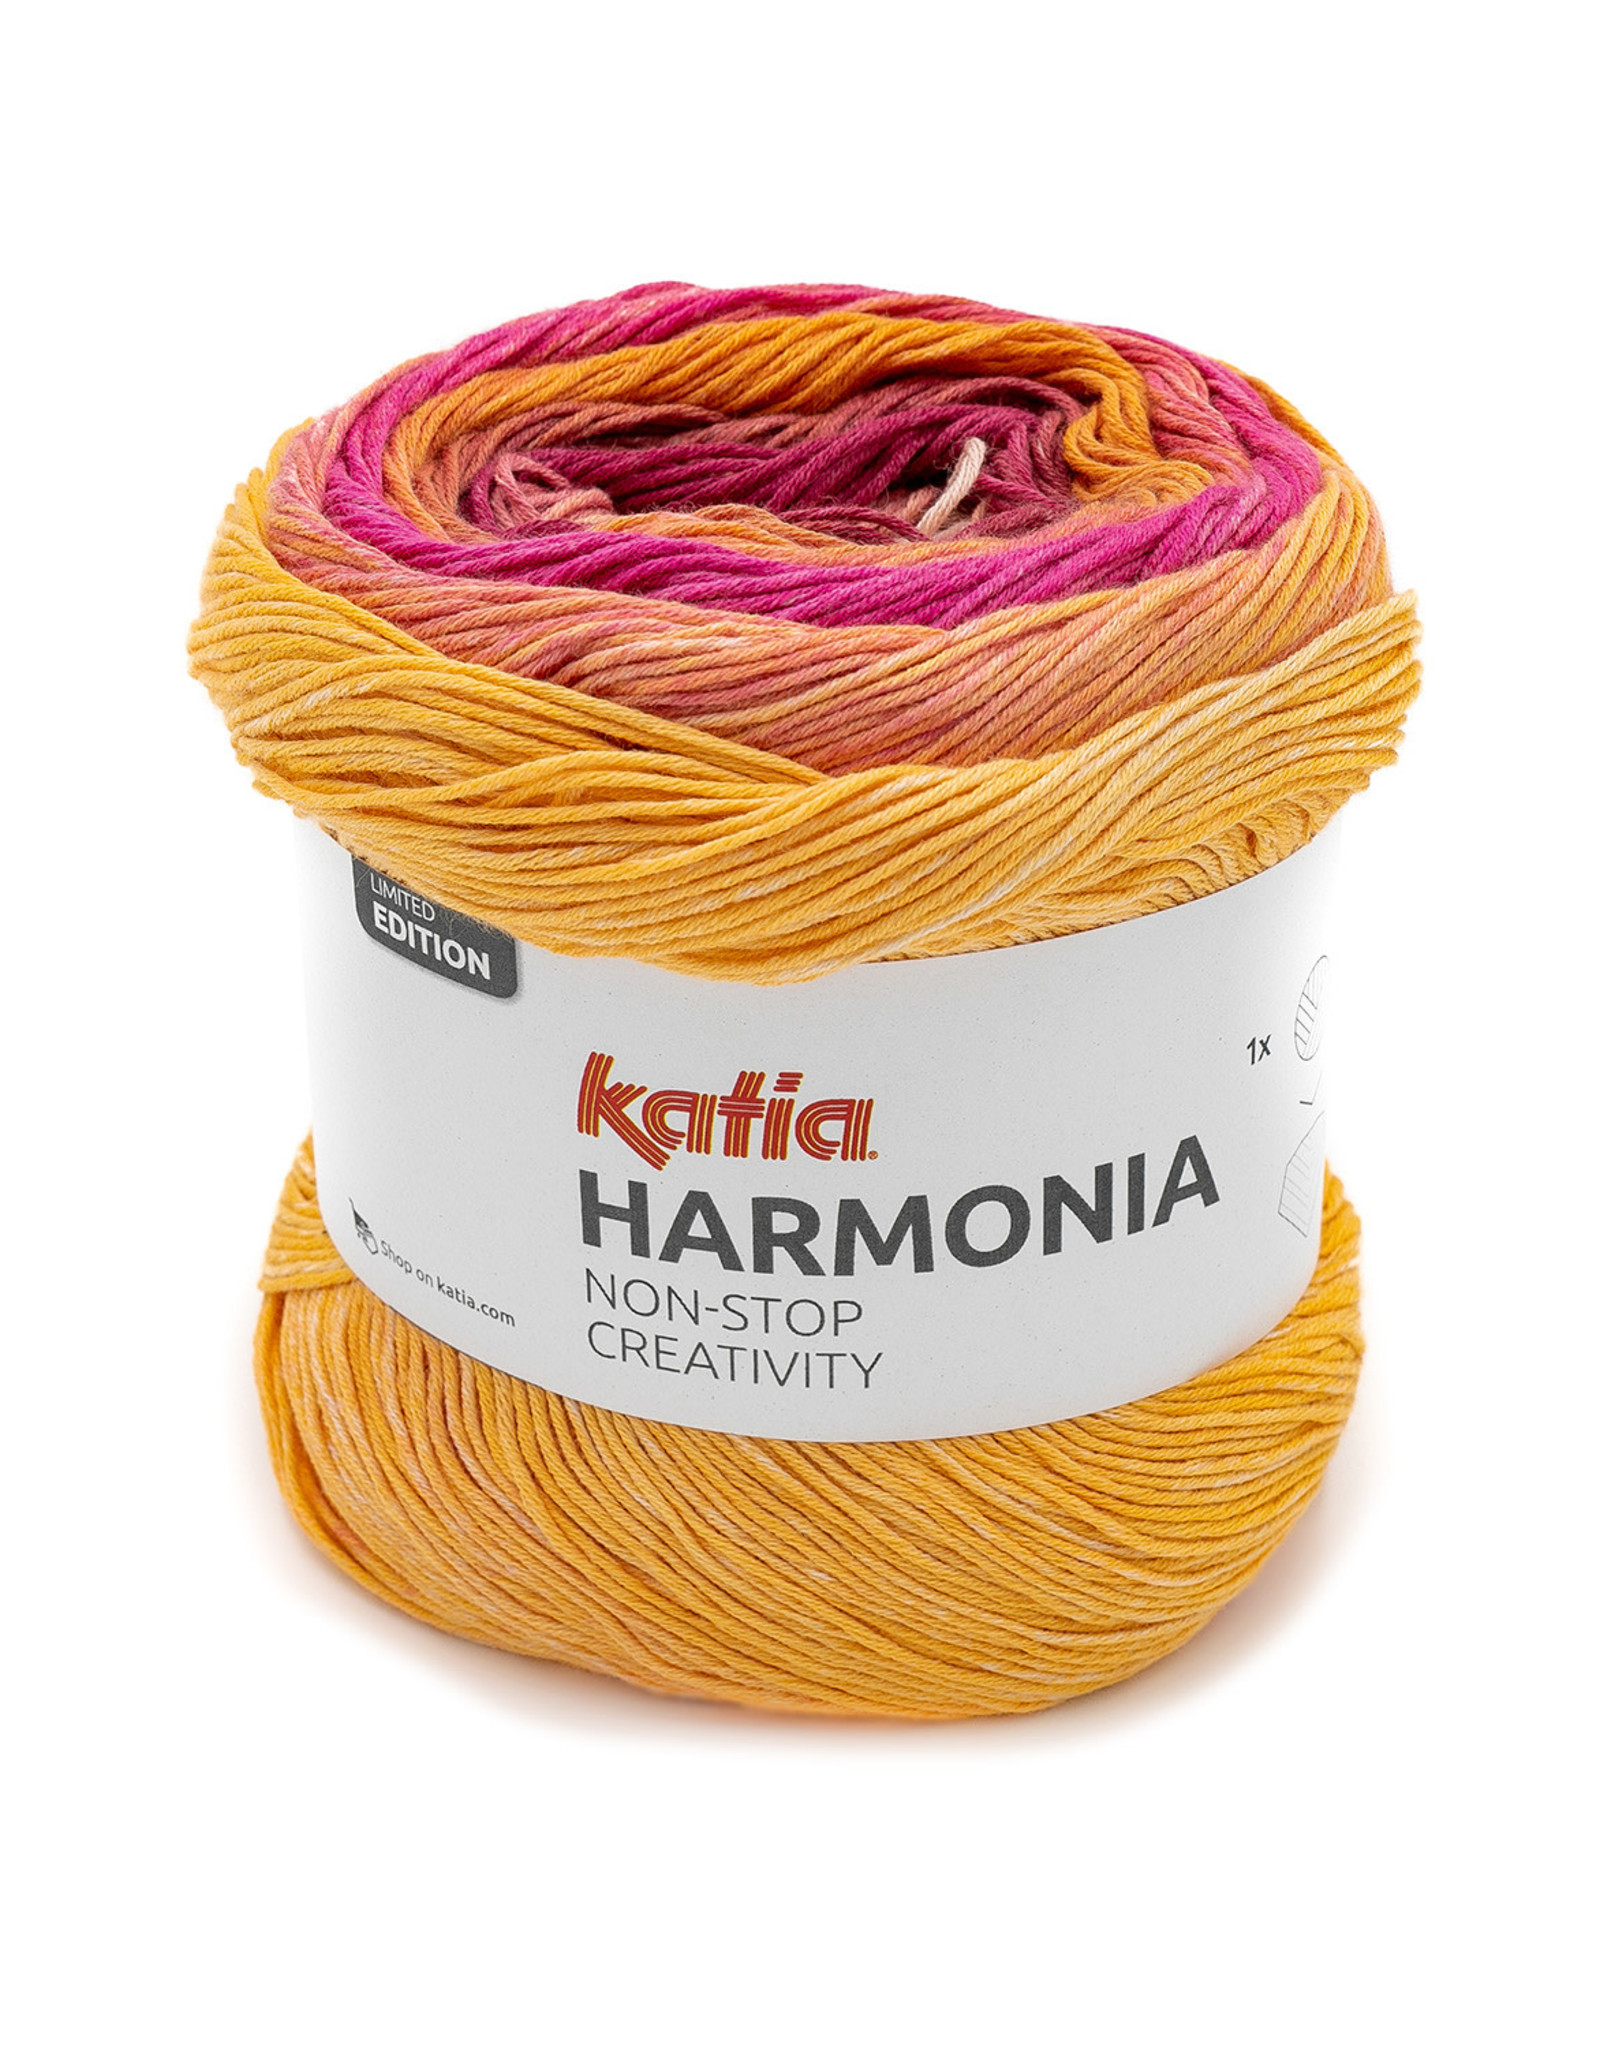 Katia Katia Harmonia 203 - Bleekrood-Oranje-Rood-Geel